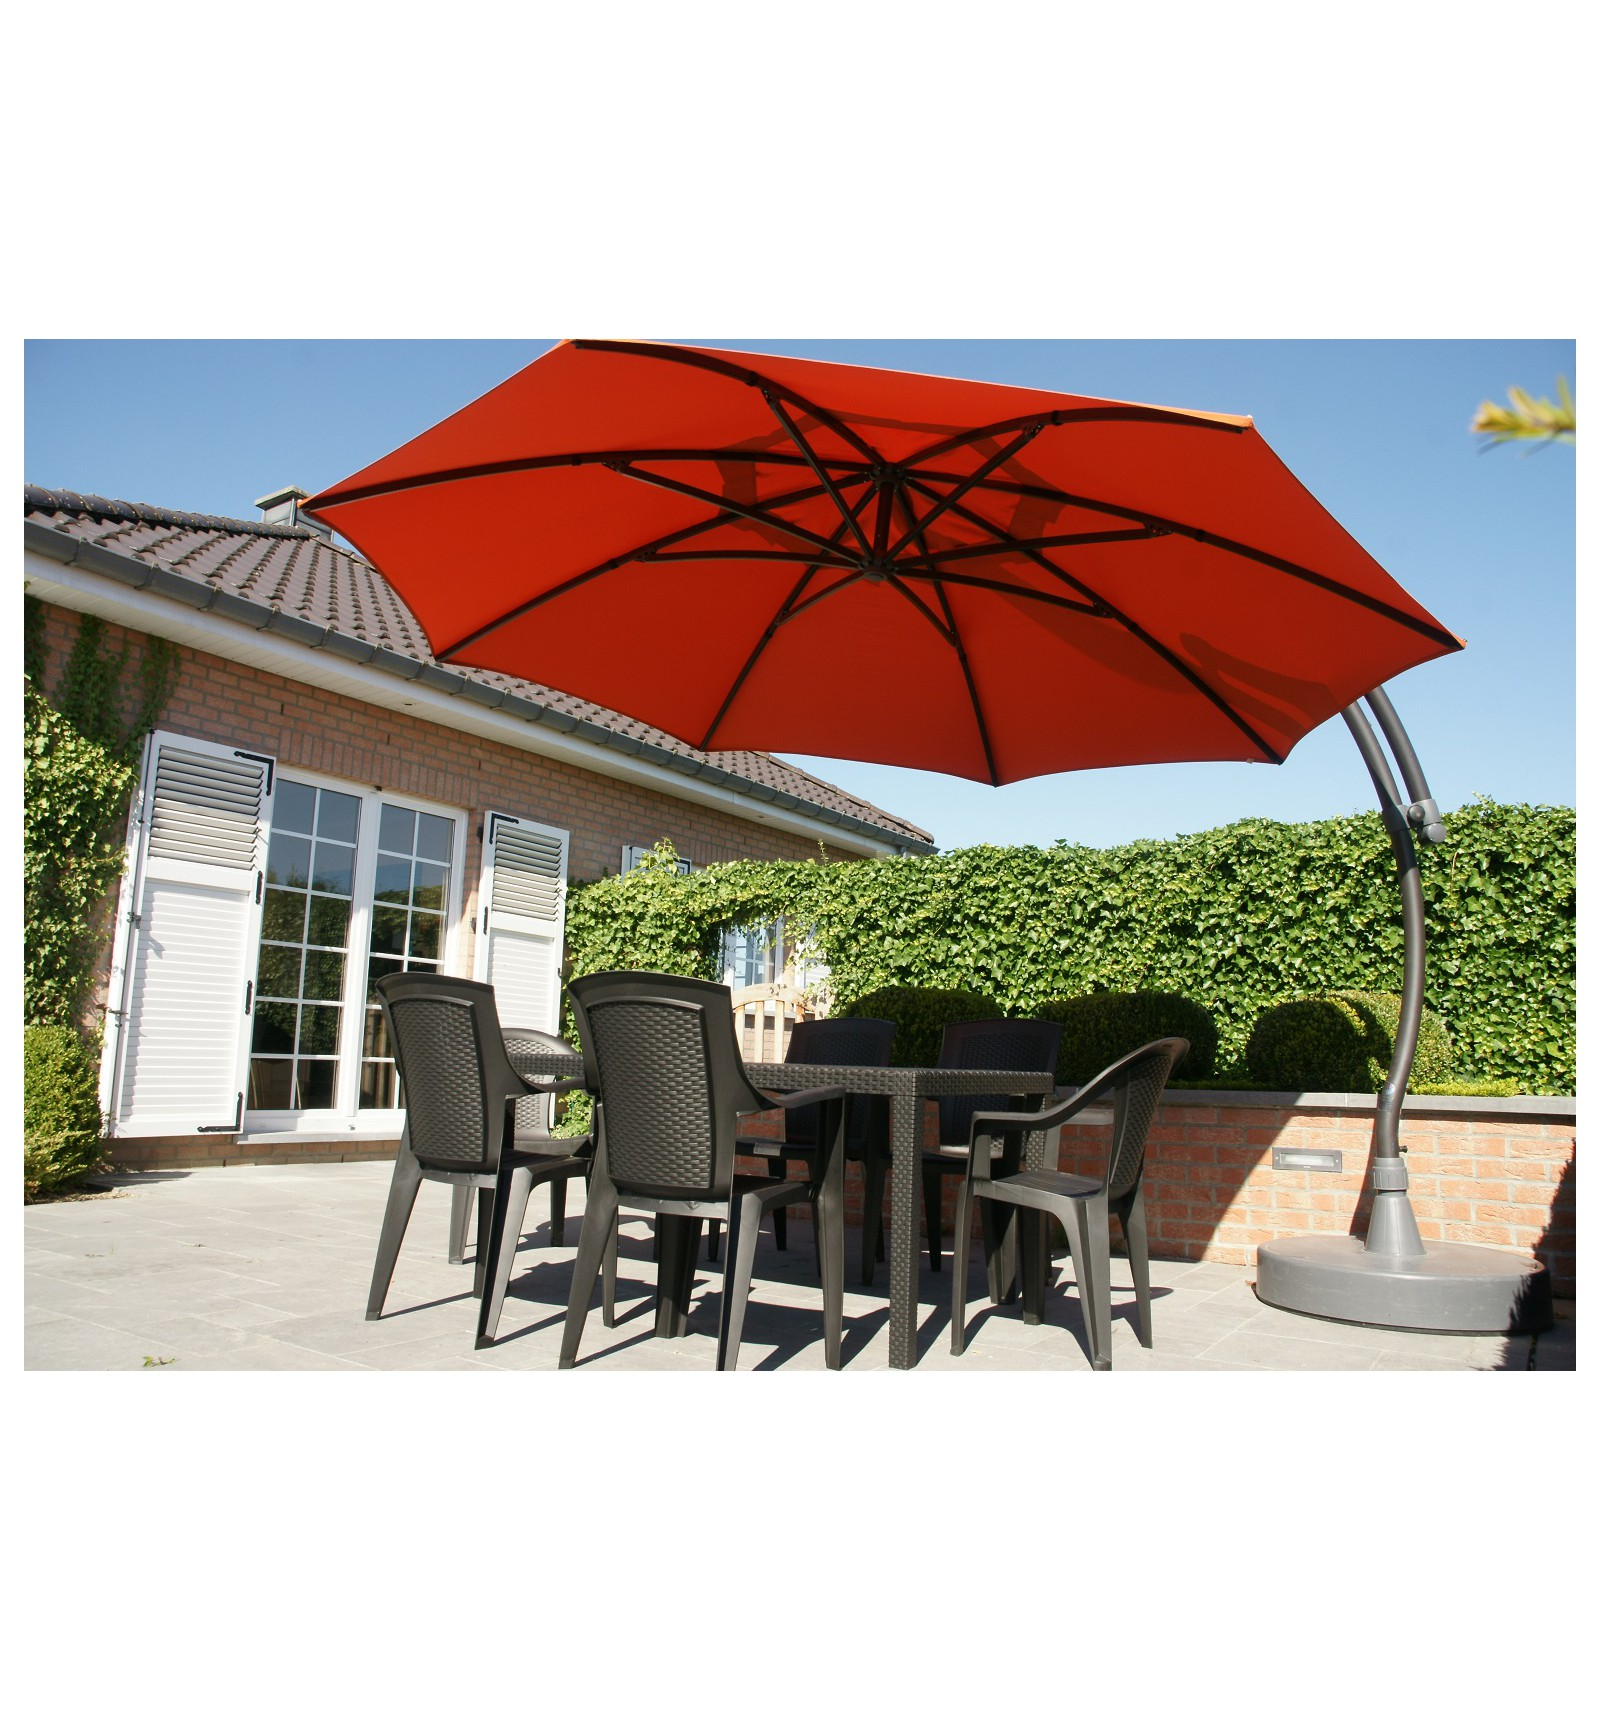 olefin vervangingsdoek voor easy sun parasol 375 terracotta. Black Bedroom Furniture Sets. Home Design Ideas